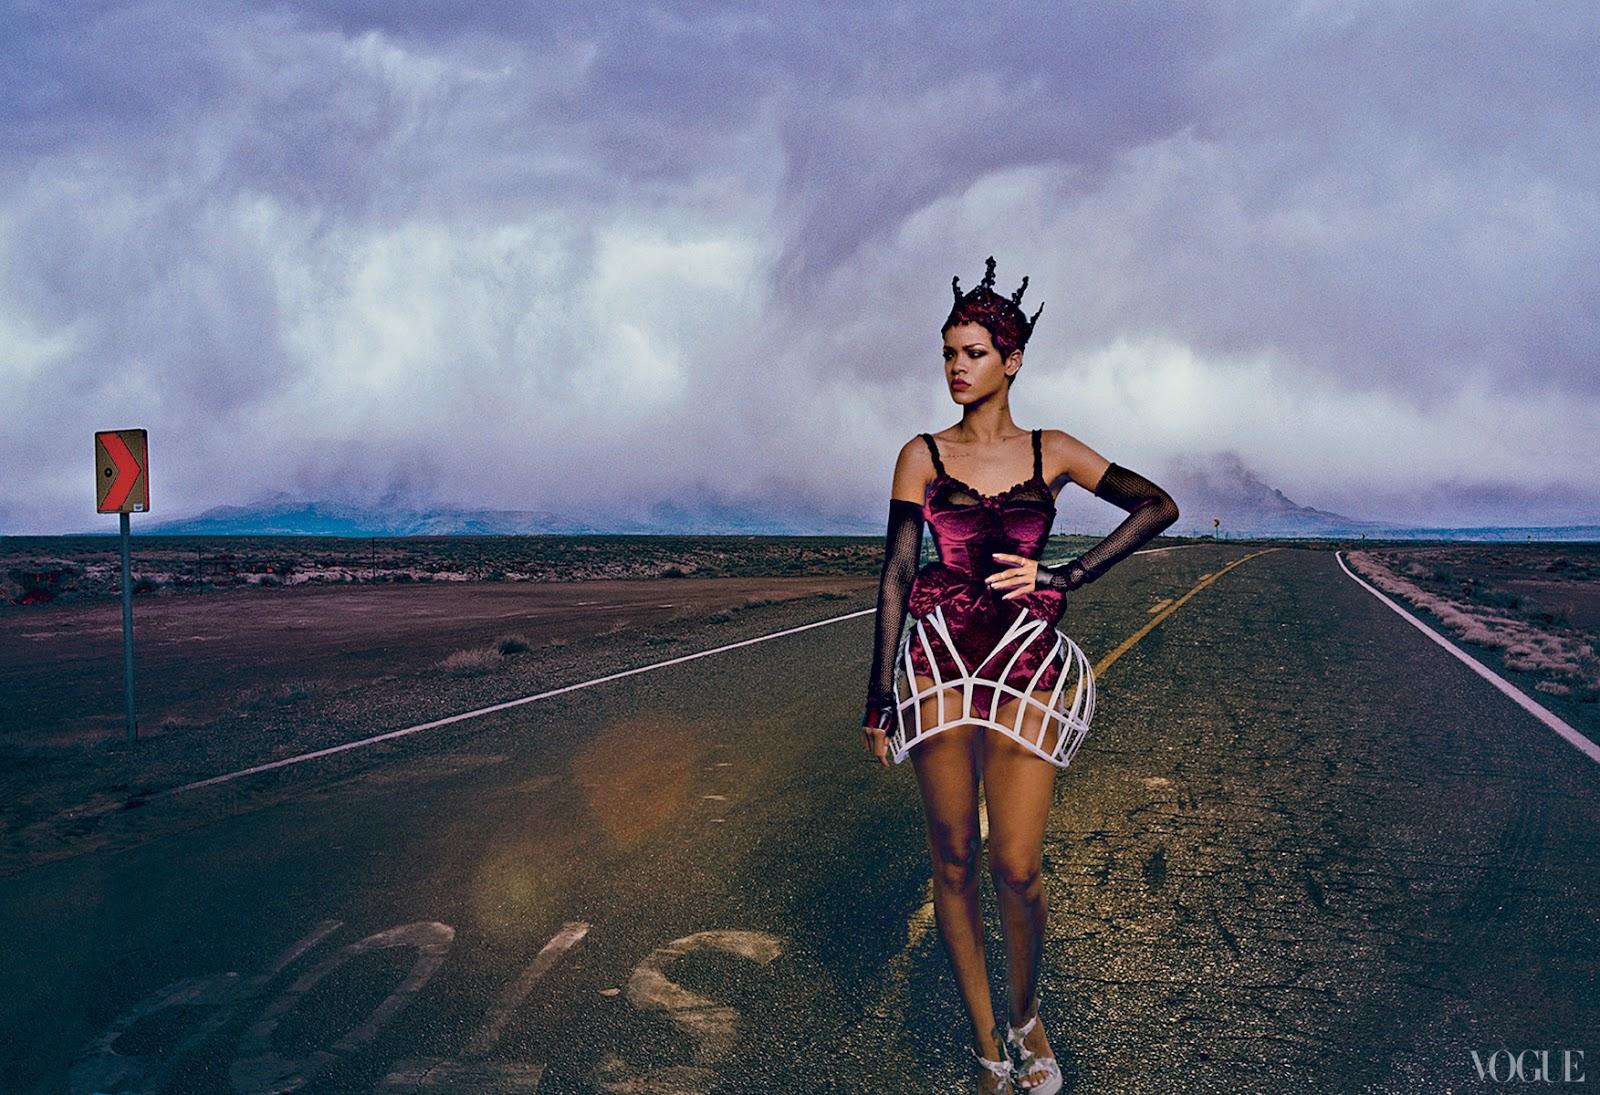 http://2.bp.blogspot.com/-7TZq6TJ-yRE/UHwITqmVvYI/AAAAAAAATV4/vpwWekvf8Pg/s1600/Rihanna+-+Vogue+magazine+November+2012+issue+-07.jpg